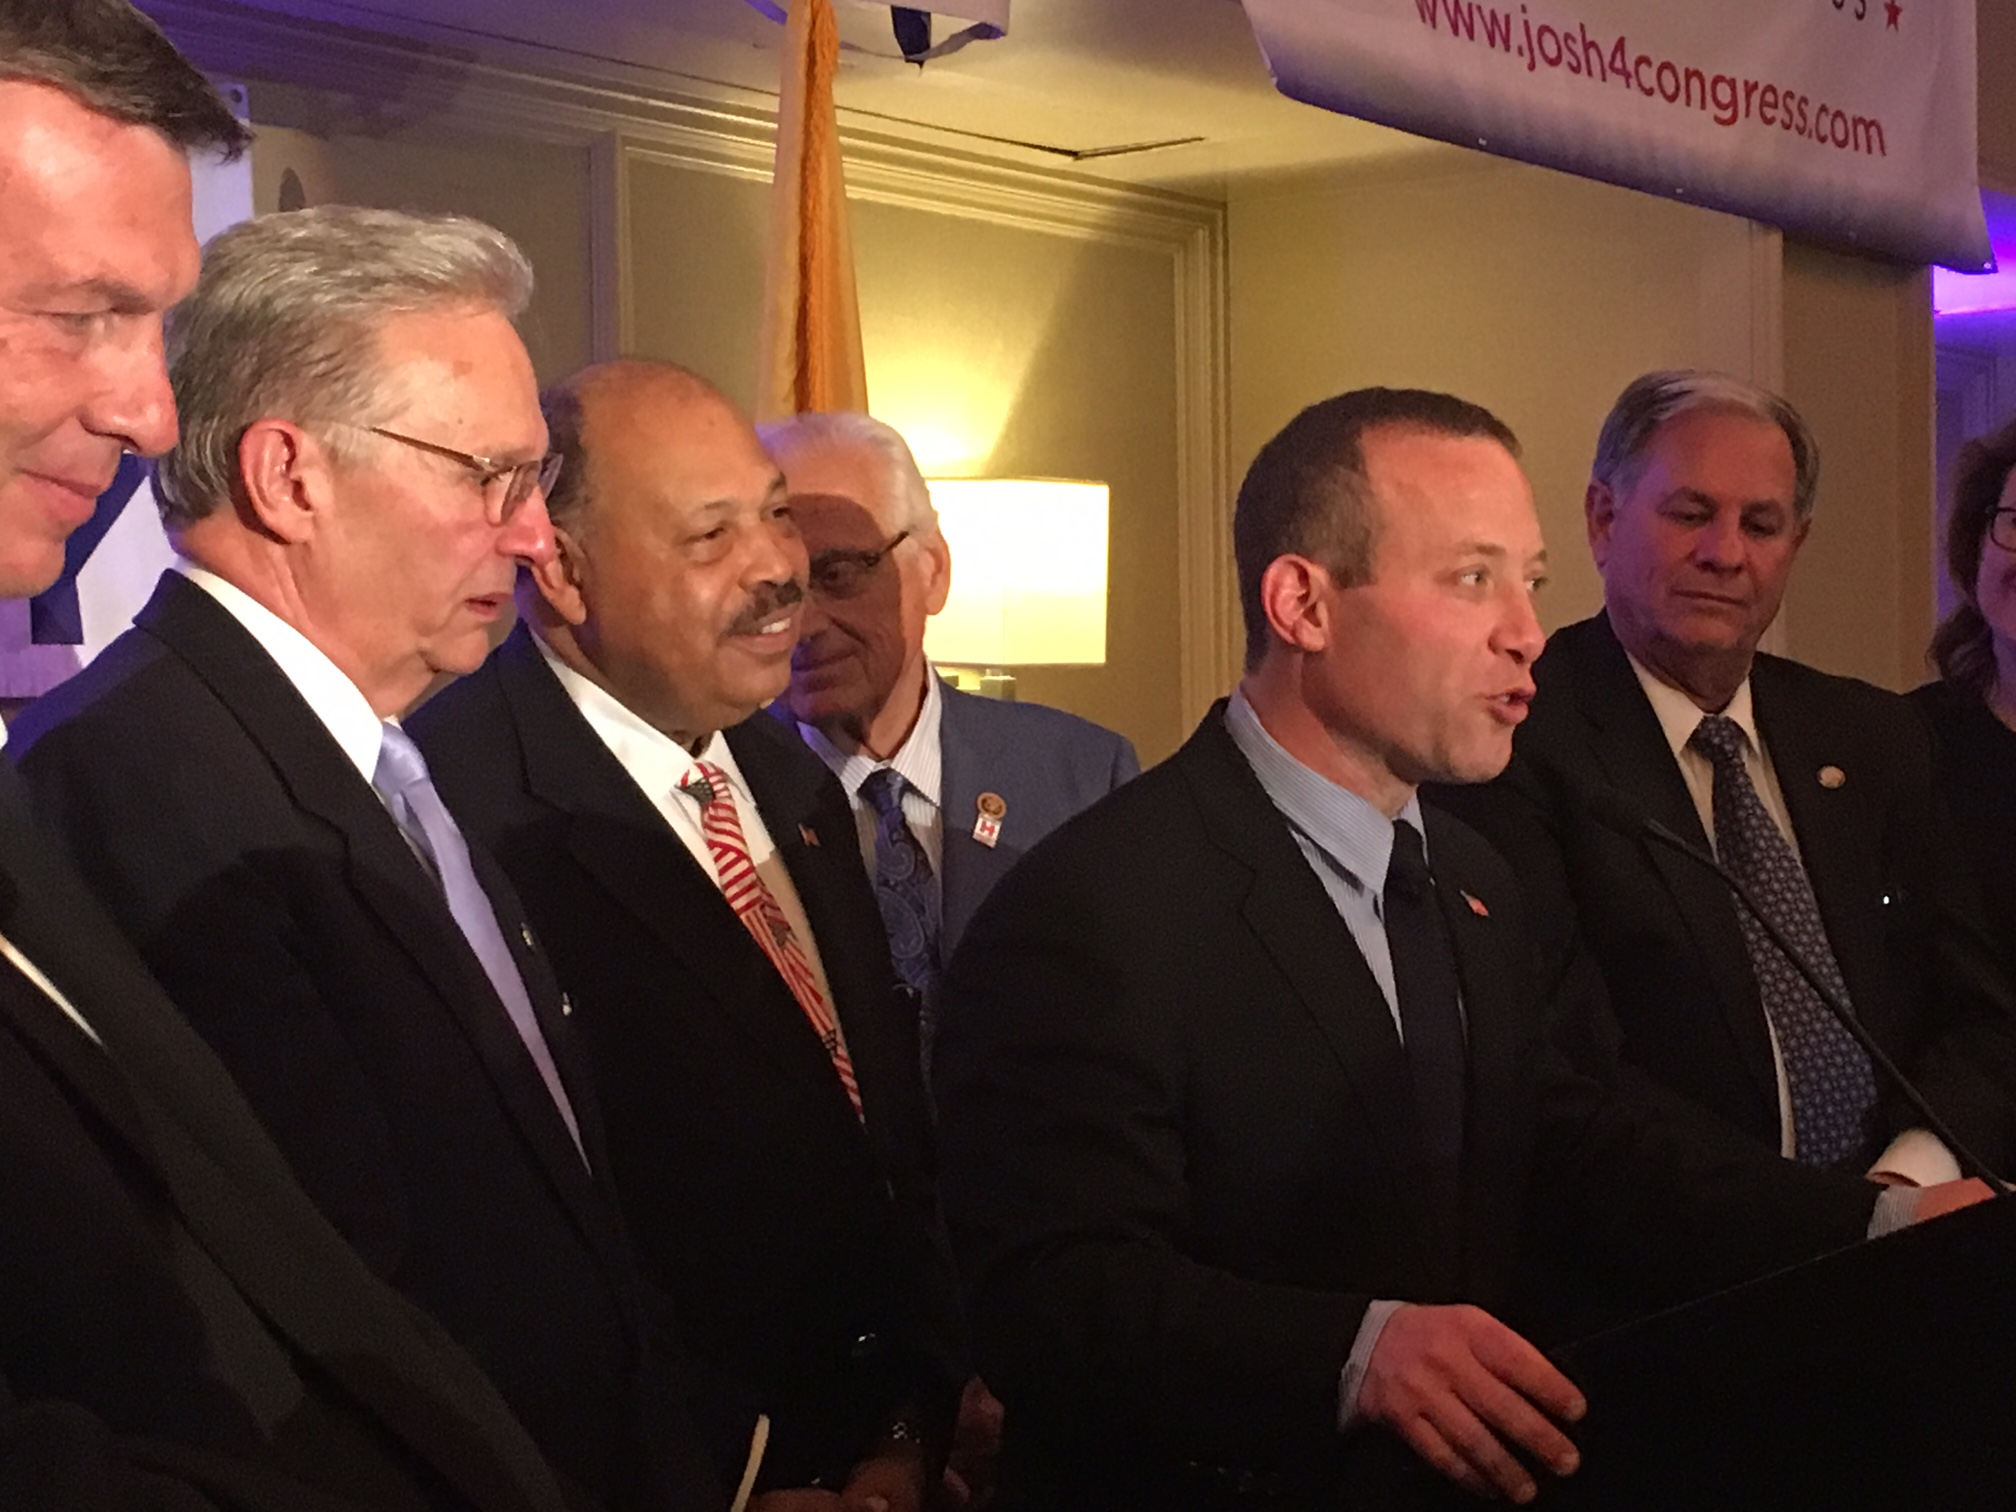 Congressman-elect Josh Gottheimer addresses Democrats following his victory.